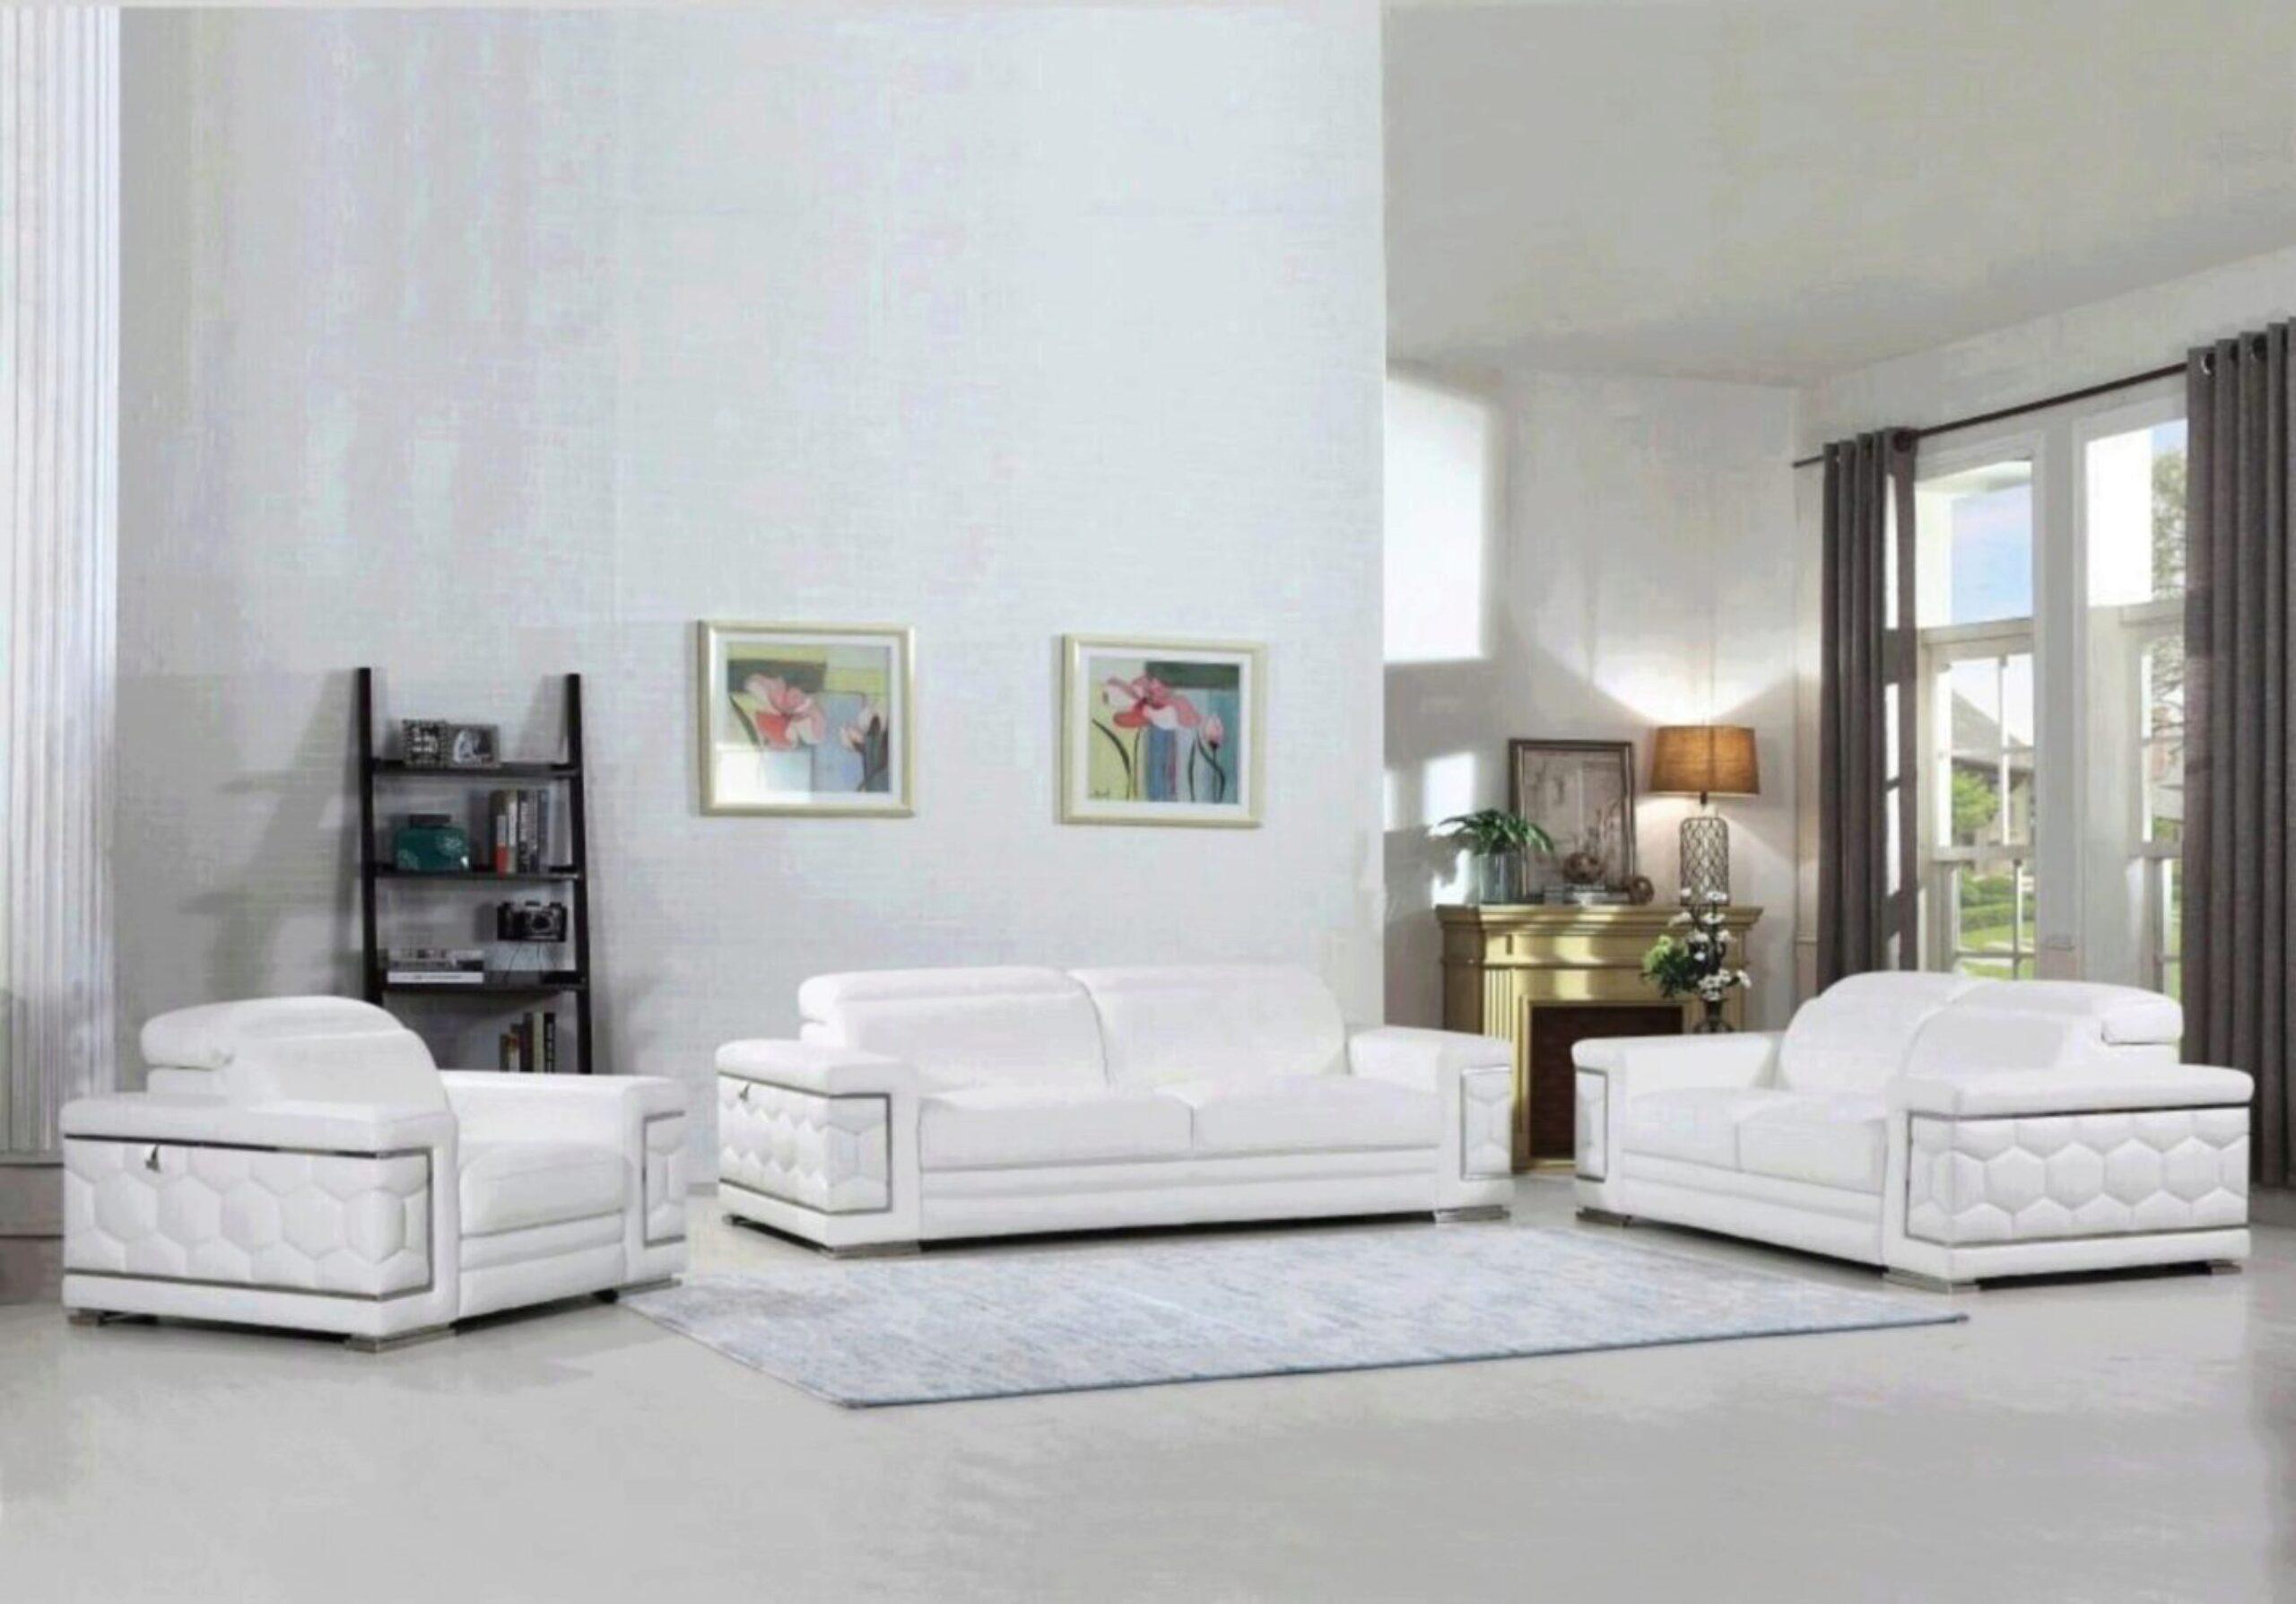 Hawkesbury Common Luxury Italian, White Leather Living Room Set